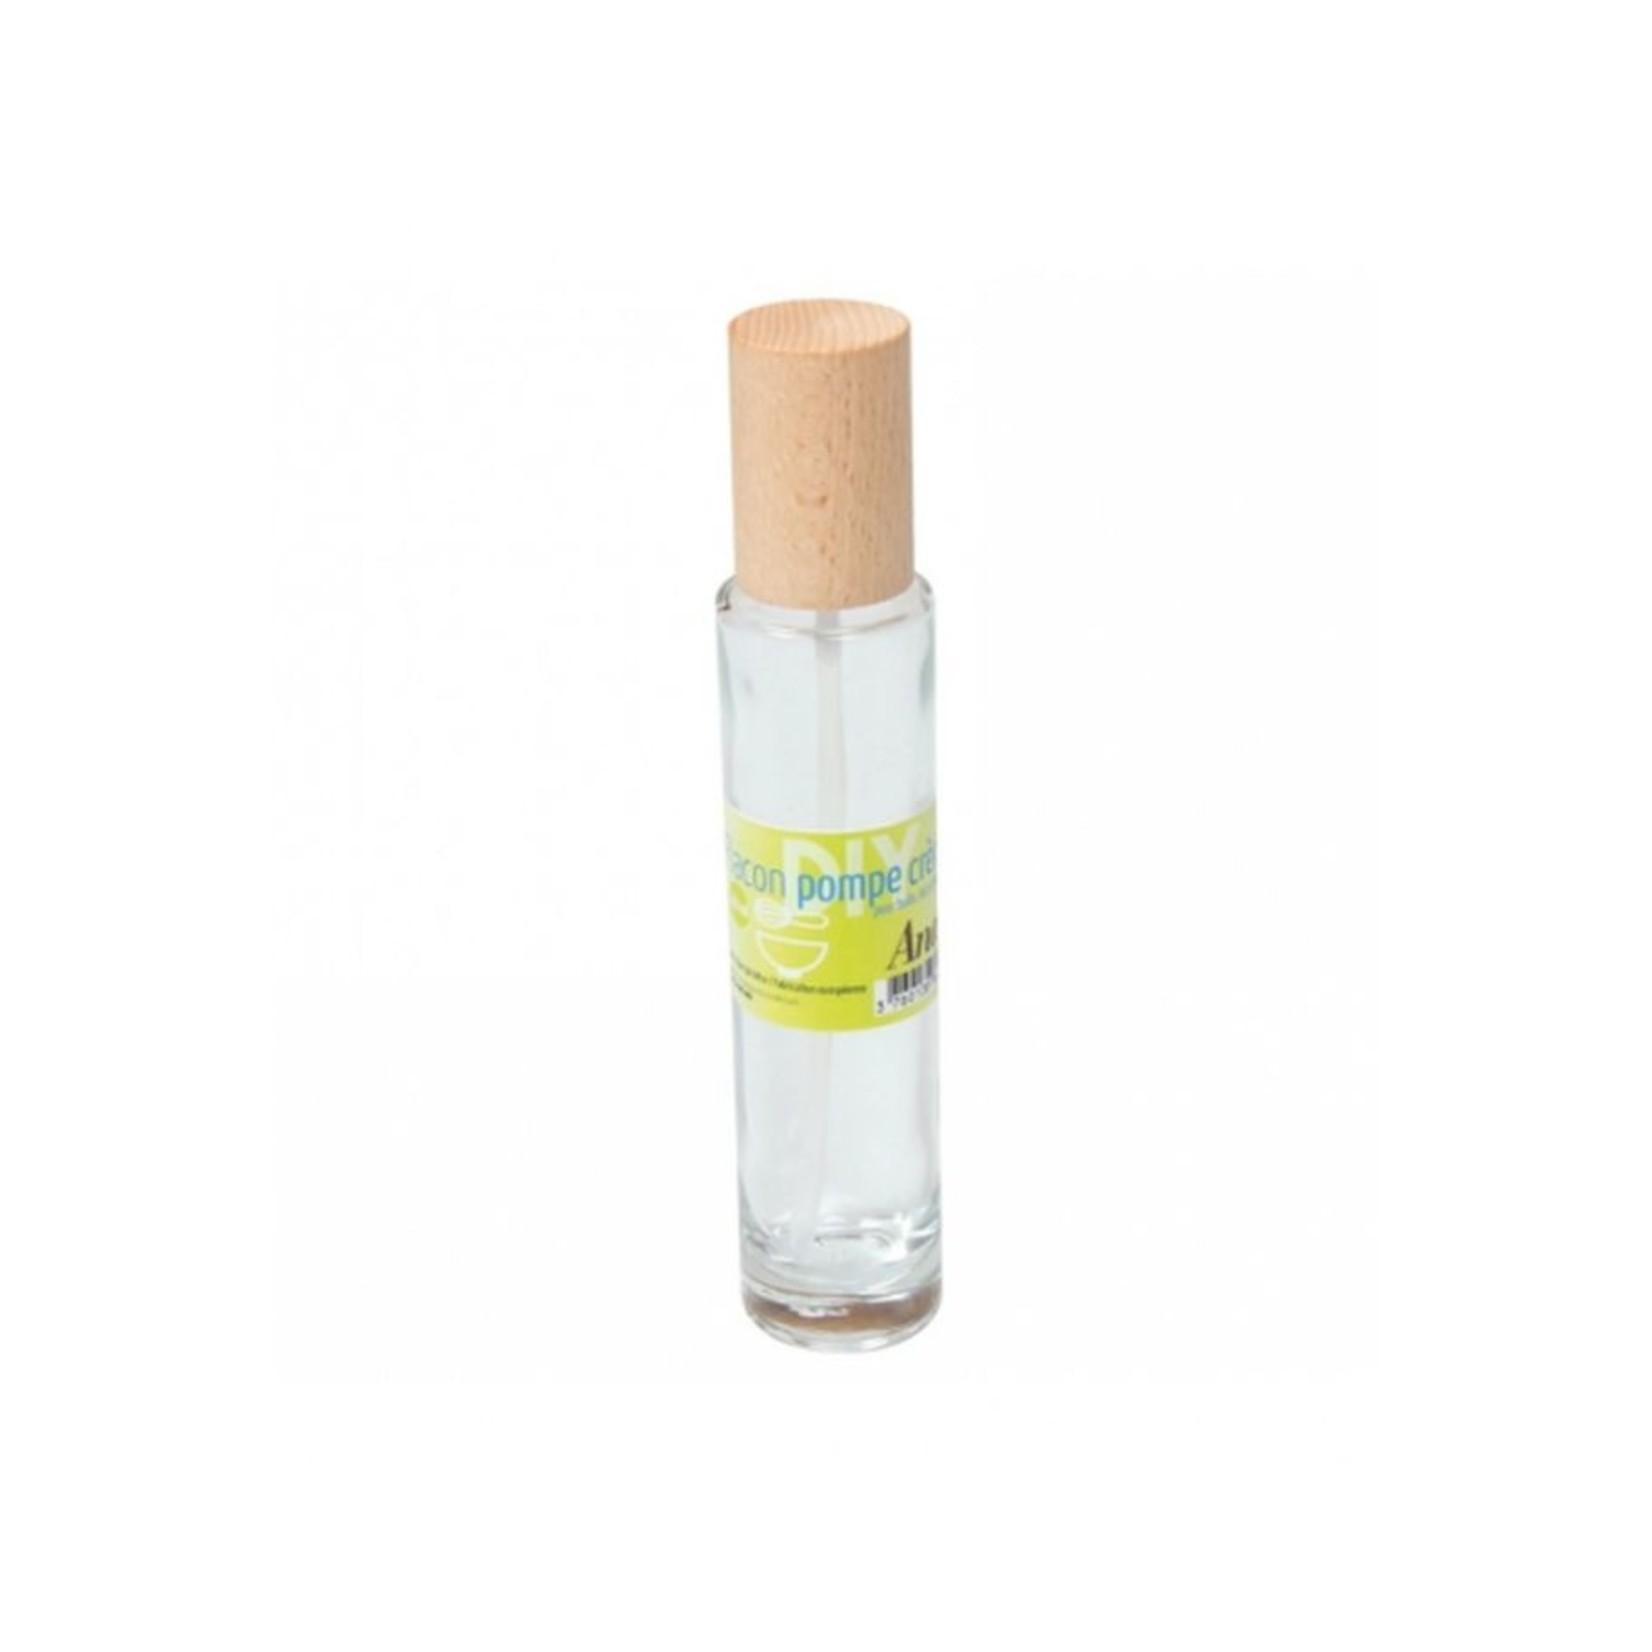 Glazen pompfles - 100ml